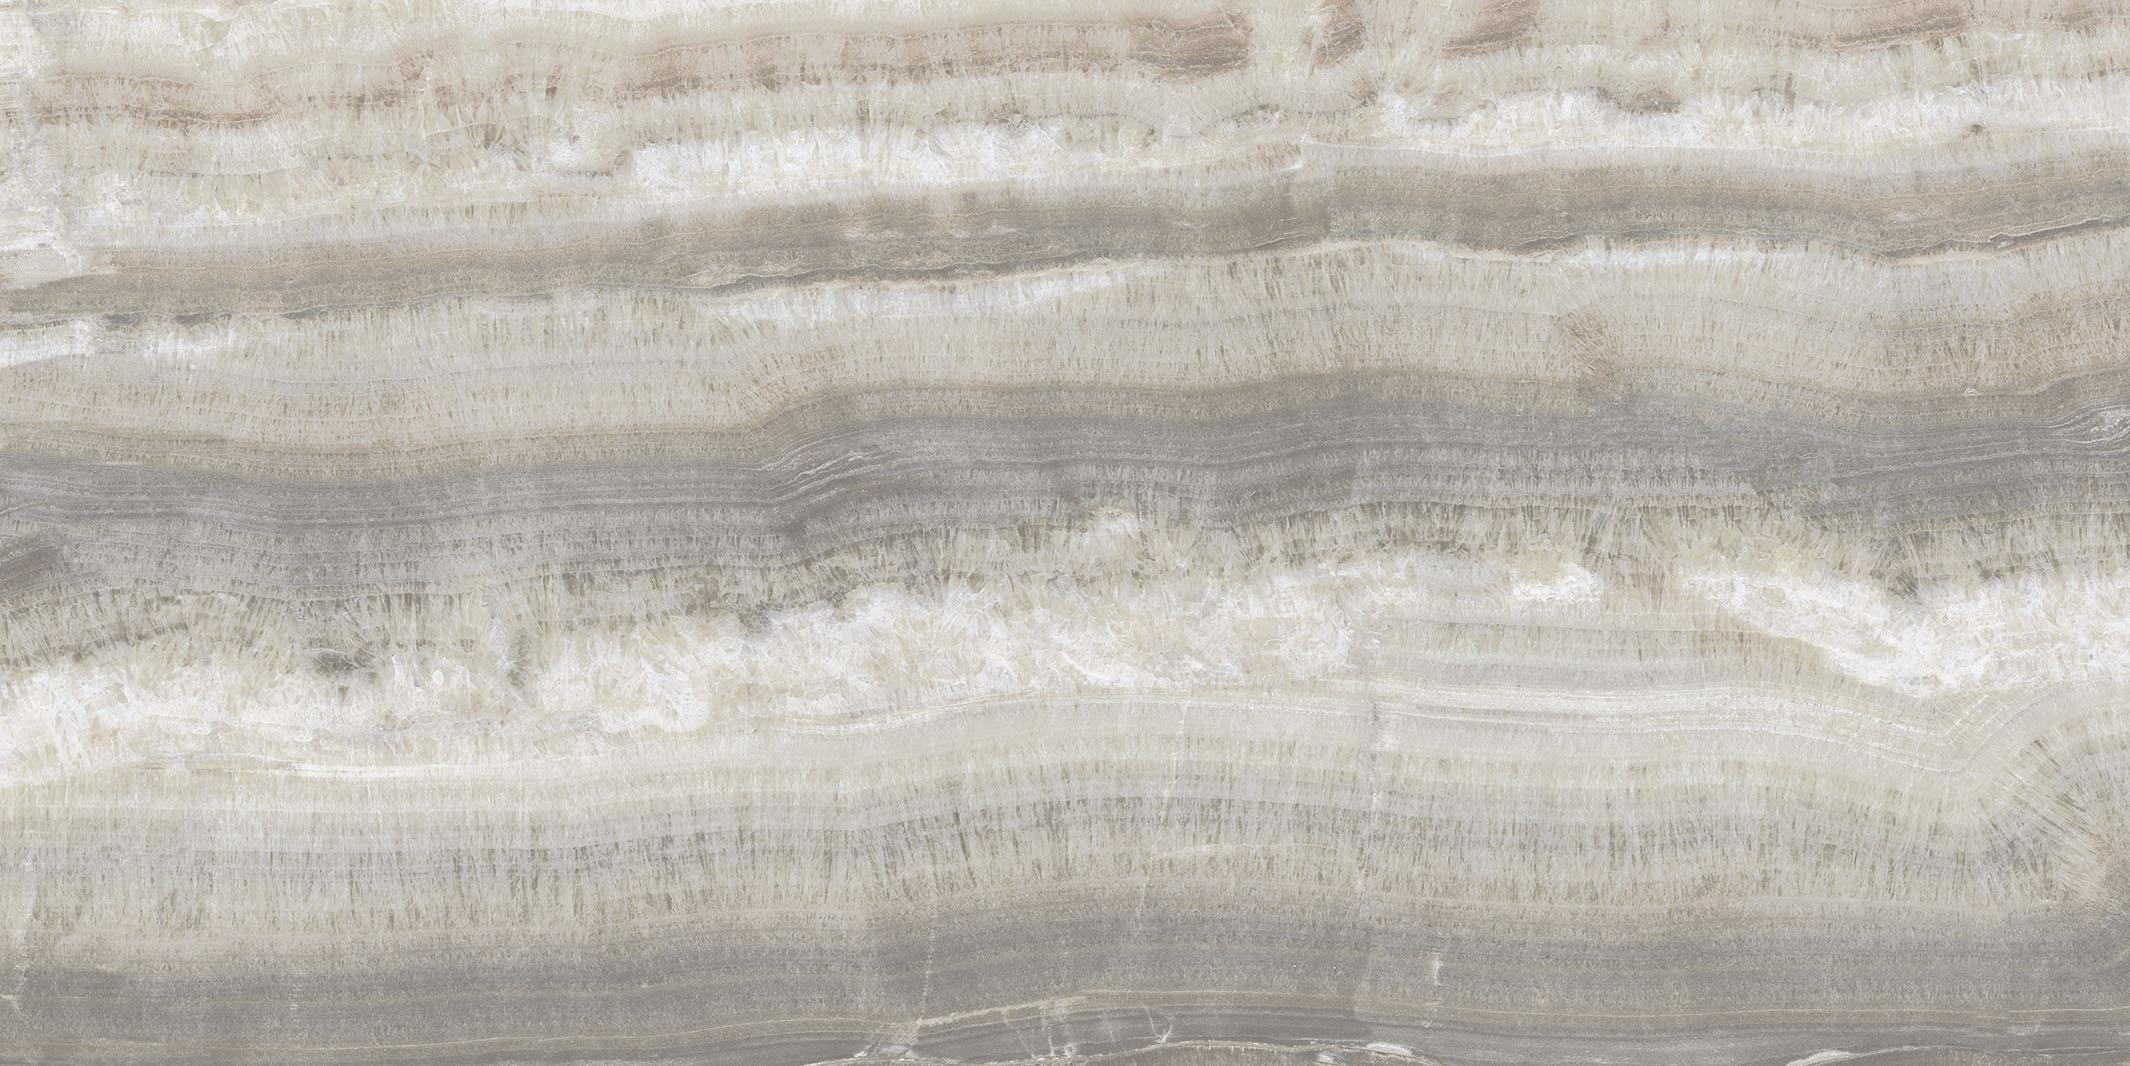 Onyx of Cerim Cloud Glossy 10mm 30 x 60